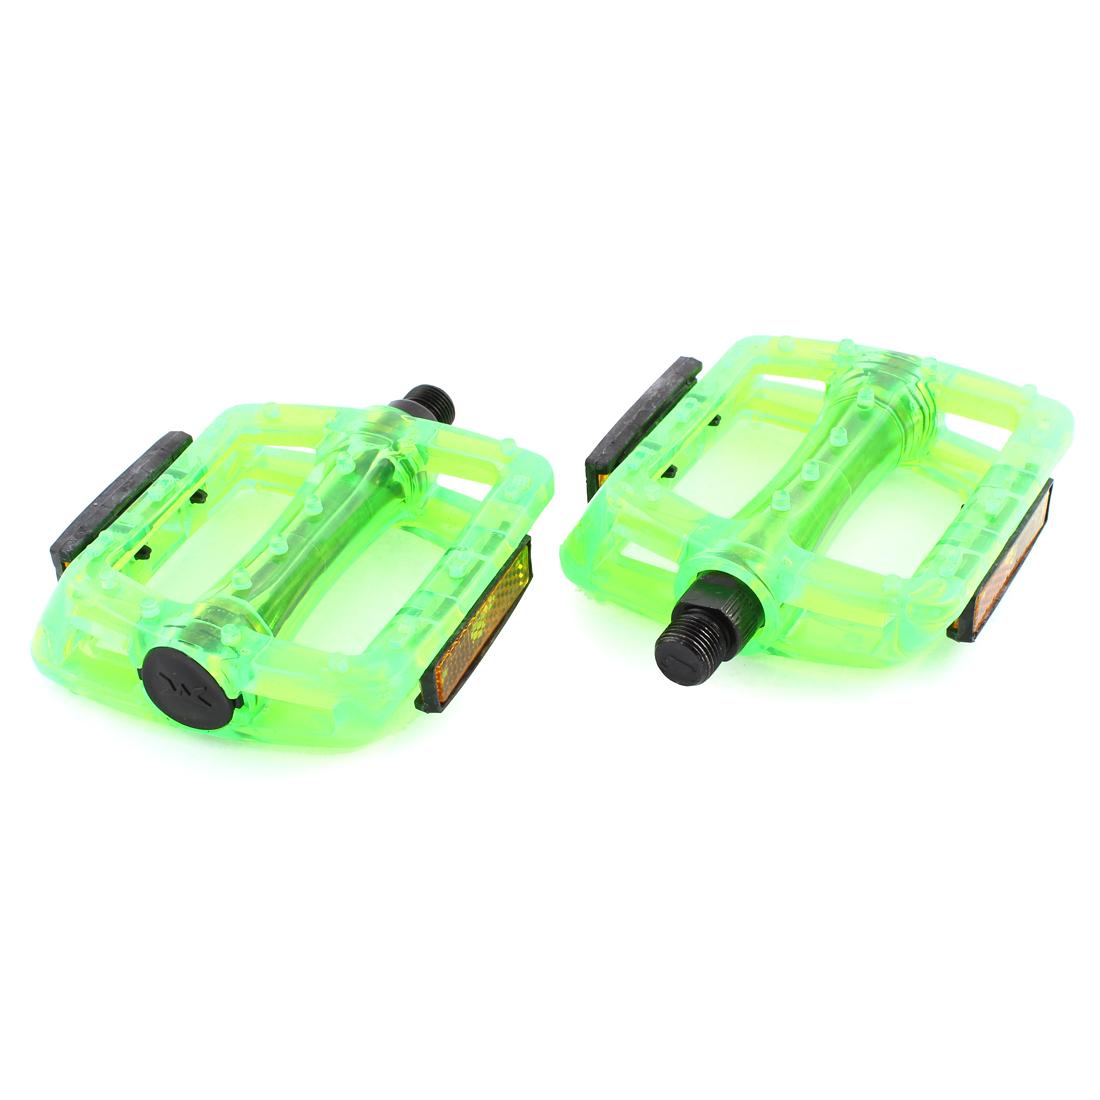 2 Pcs Bike Bicycle 13mm Thread Green Plastic Platform Pedal Replacement